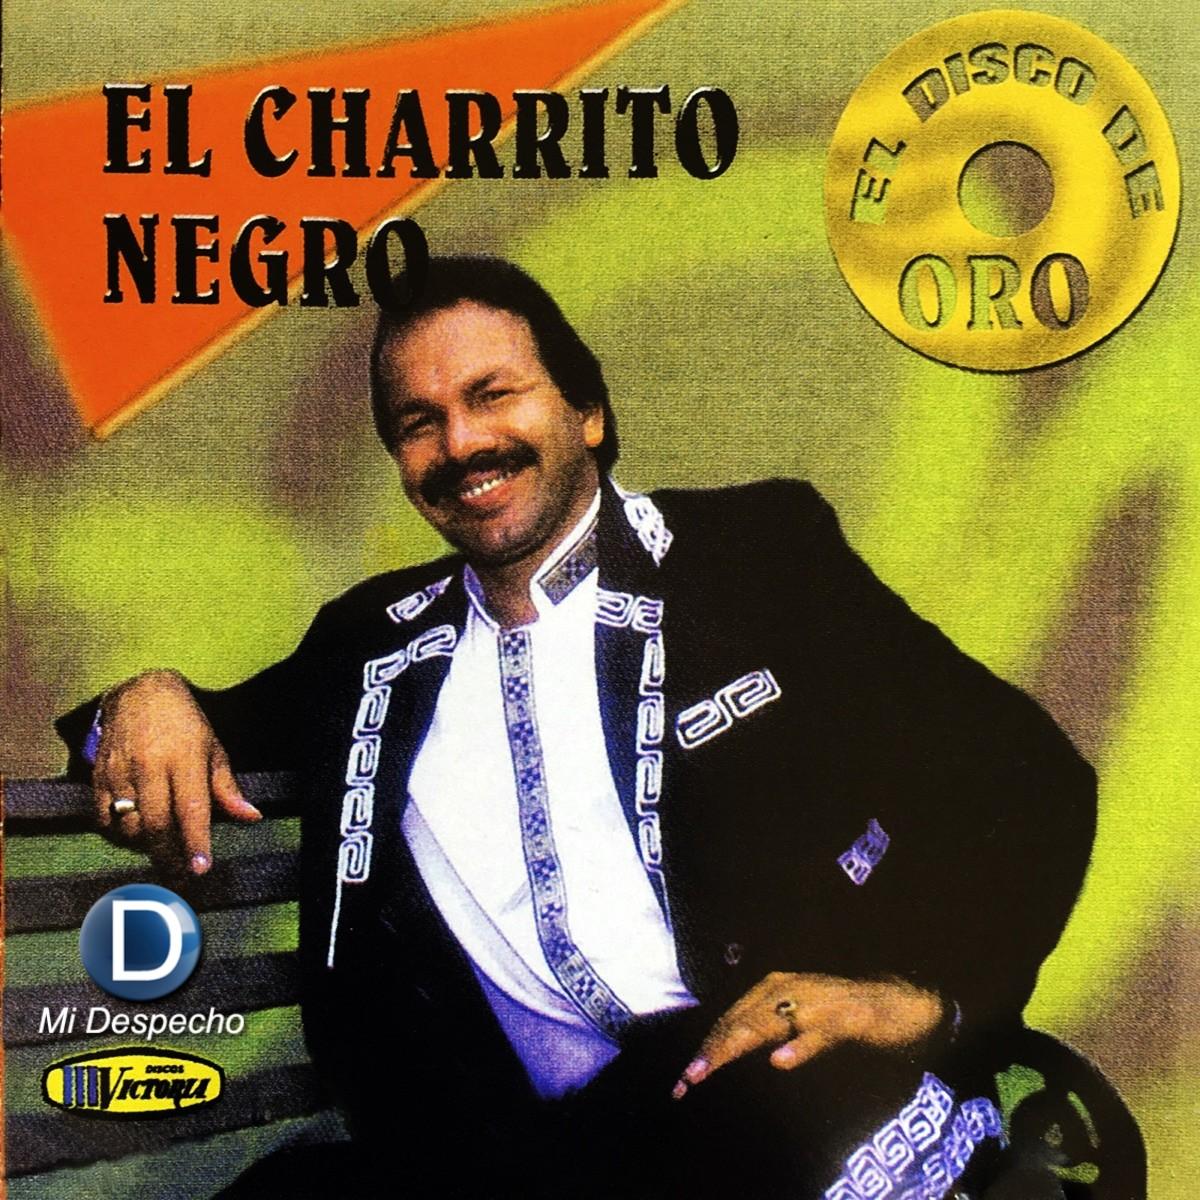 Charrito Negro El Disco De Oro Frontal